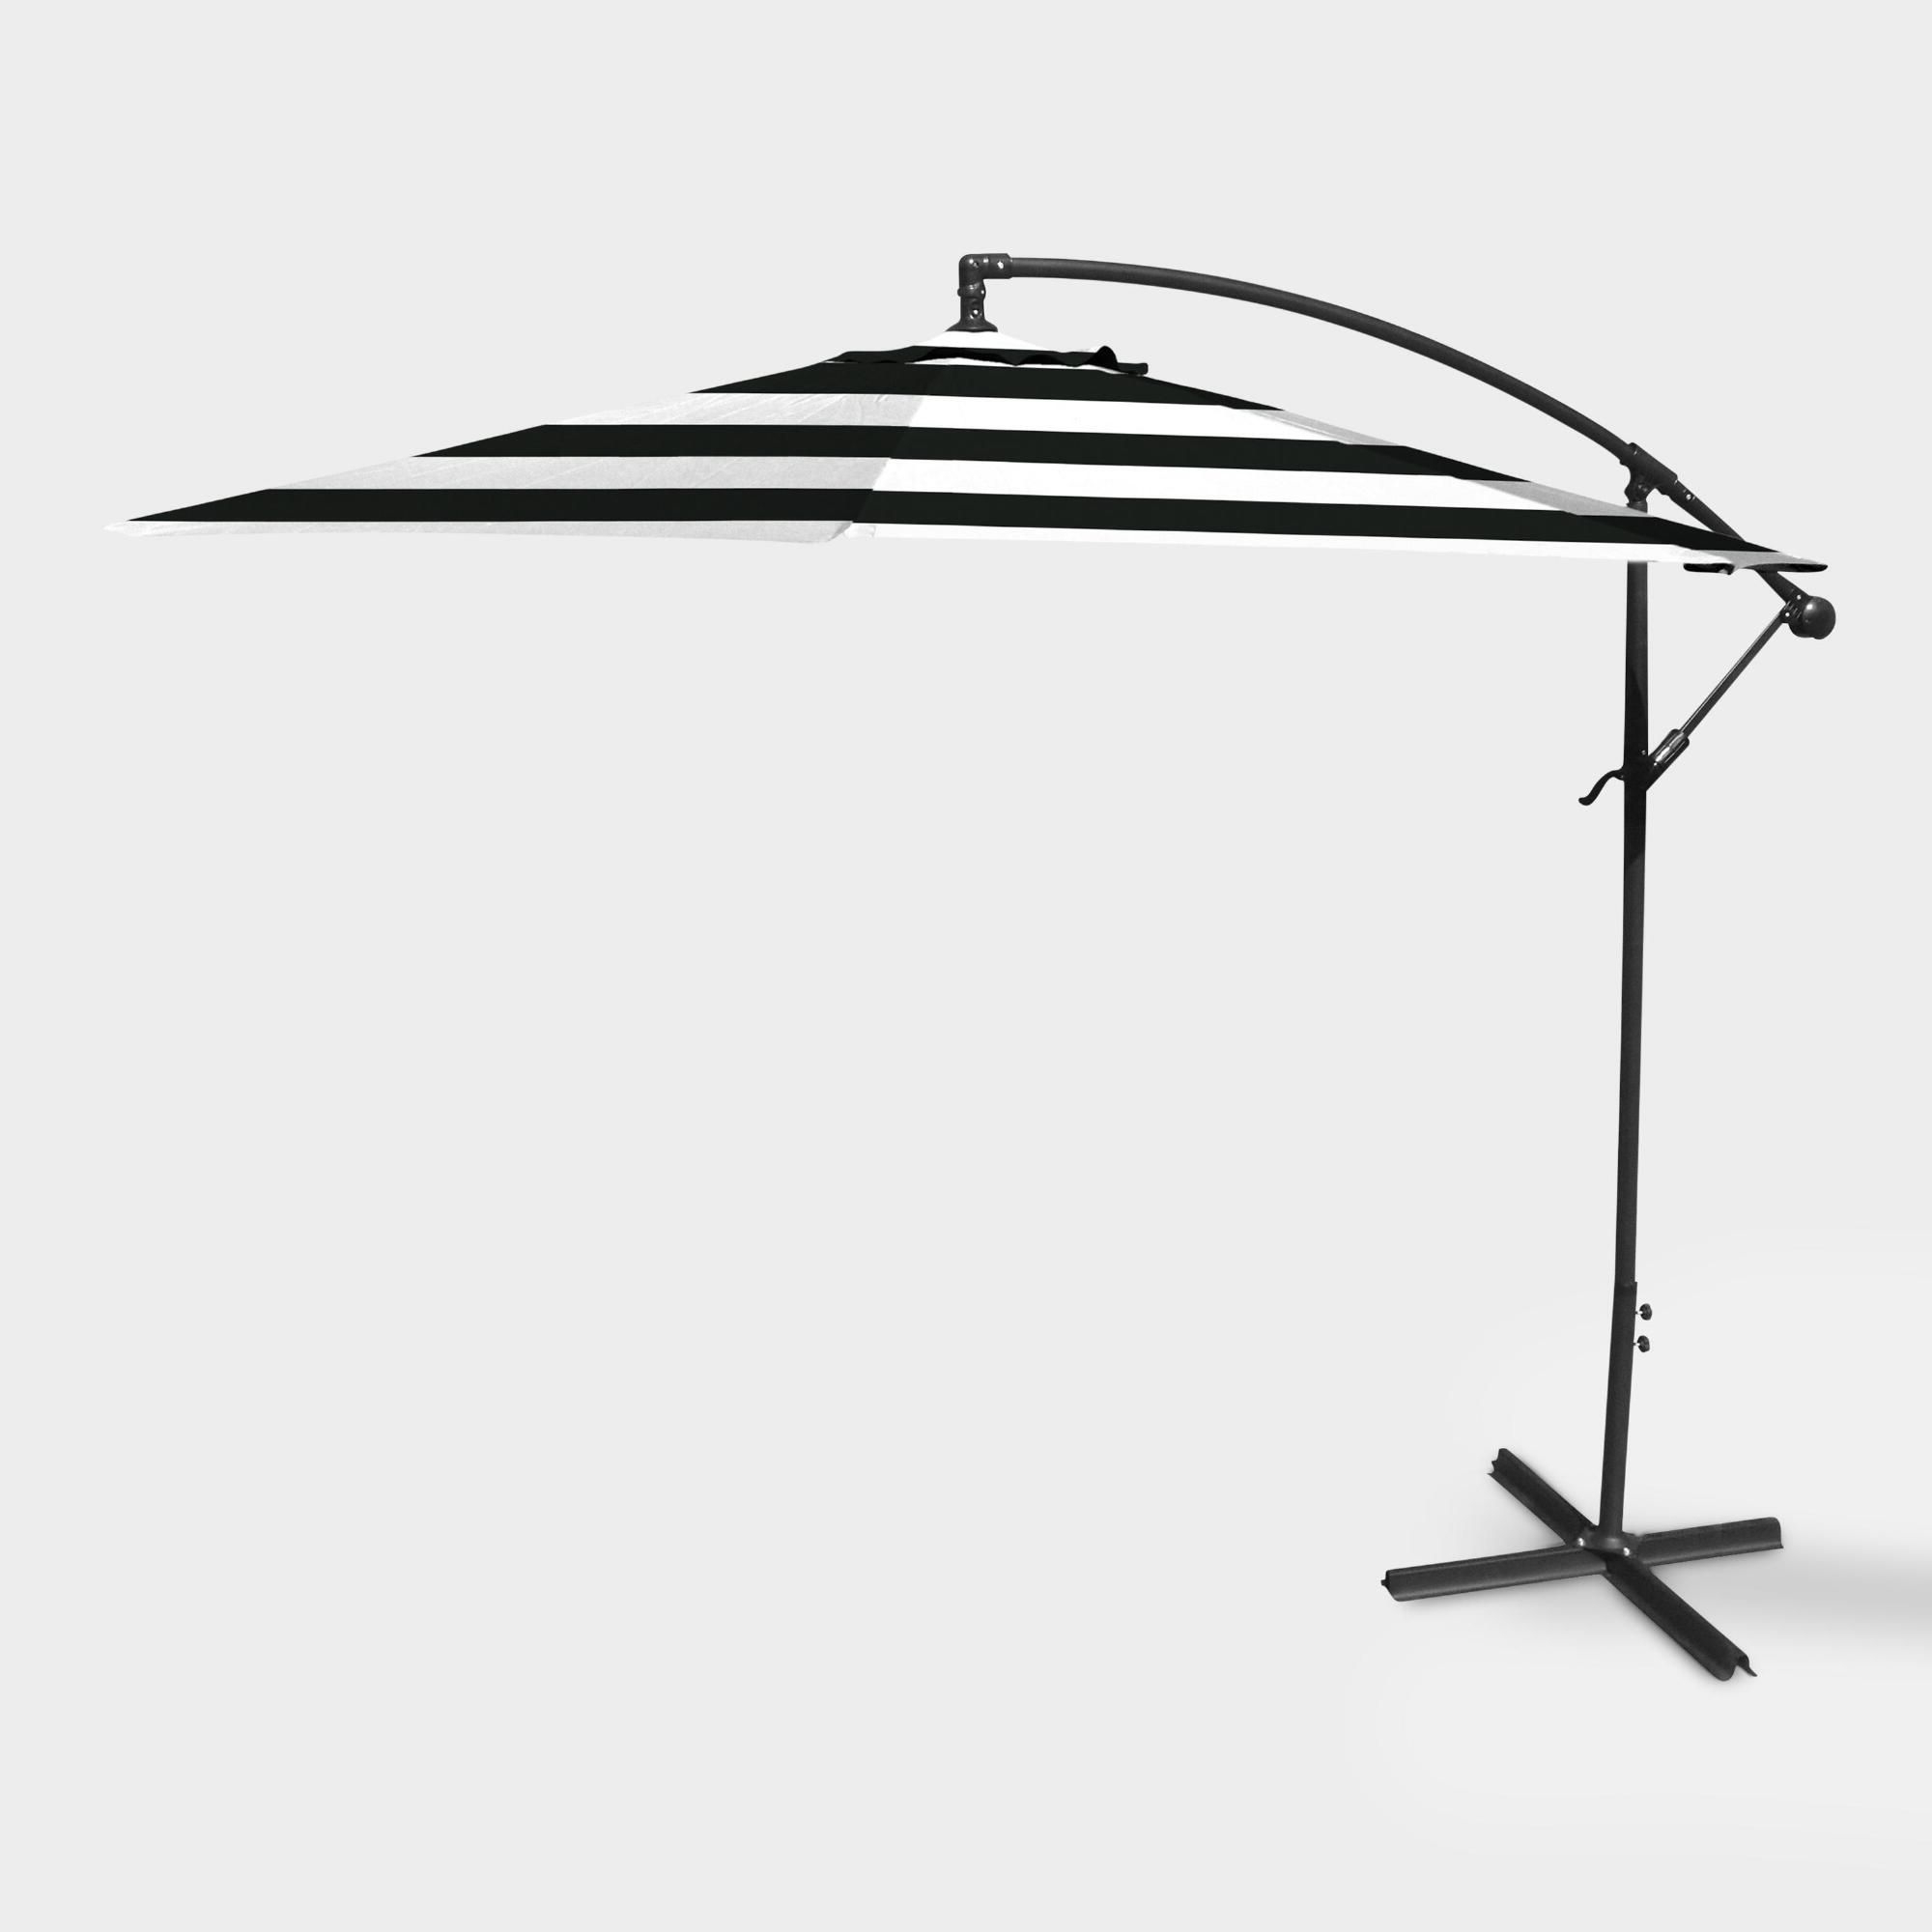 Wieczorek Auto Tilt Rectangular Market Sunbrella Umbrellas Within Most Recently Released Black Stripe 10 Ft Cantilever Outdoor Patio Umbrellaworld Market (View 8 of 20)